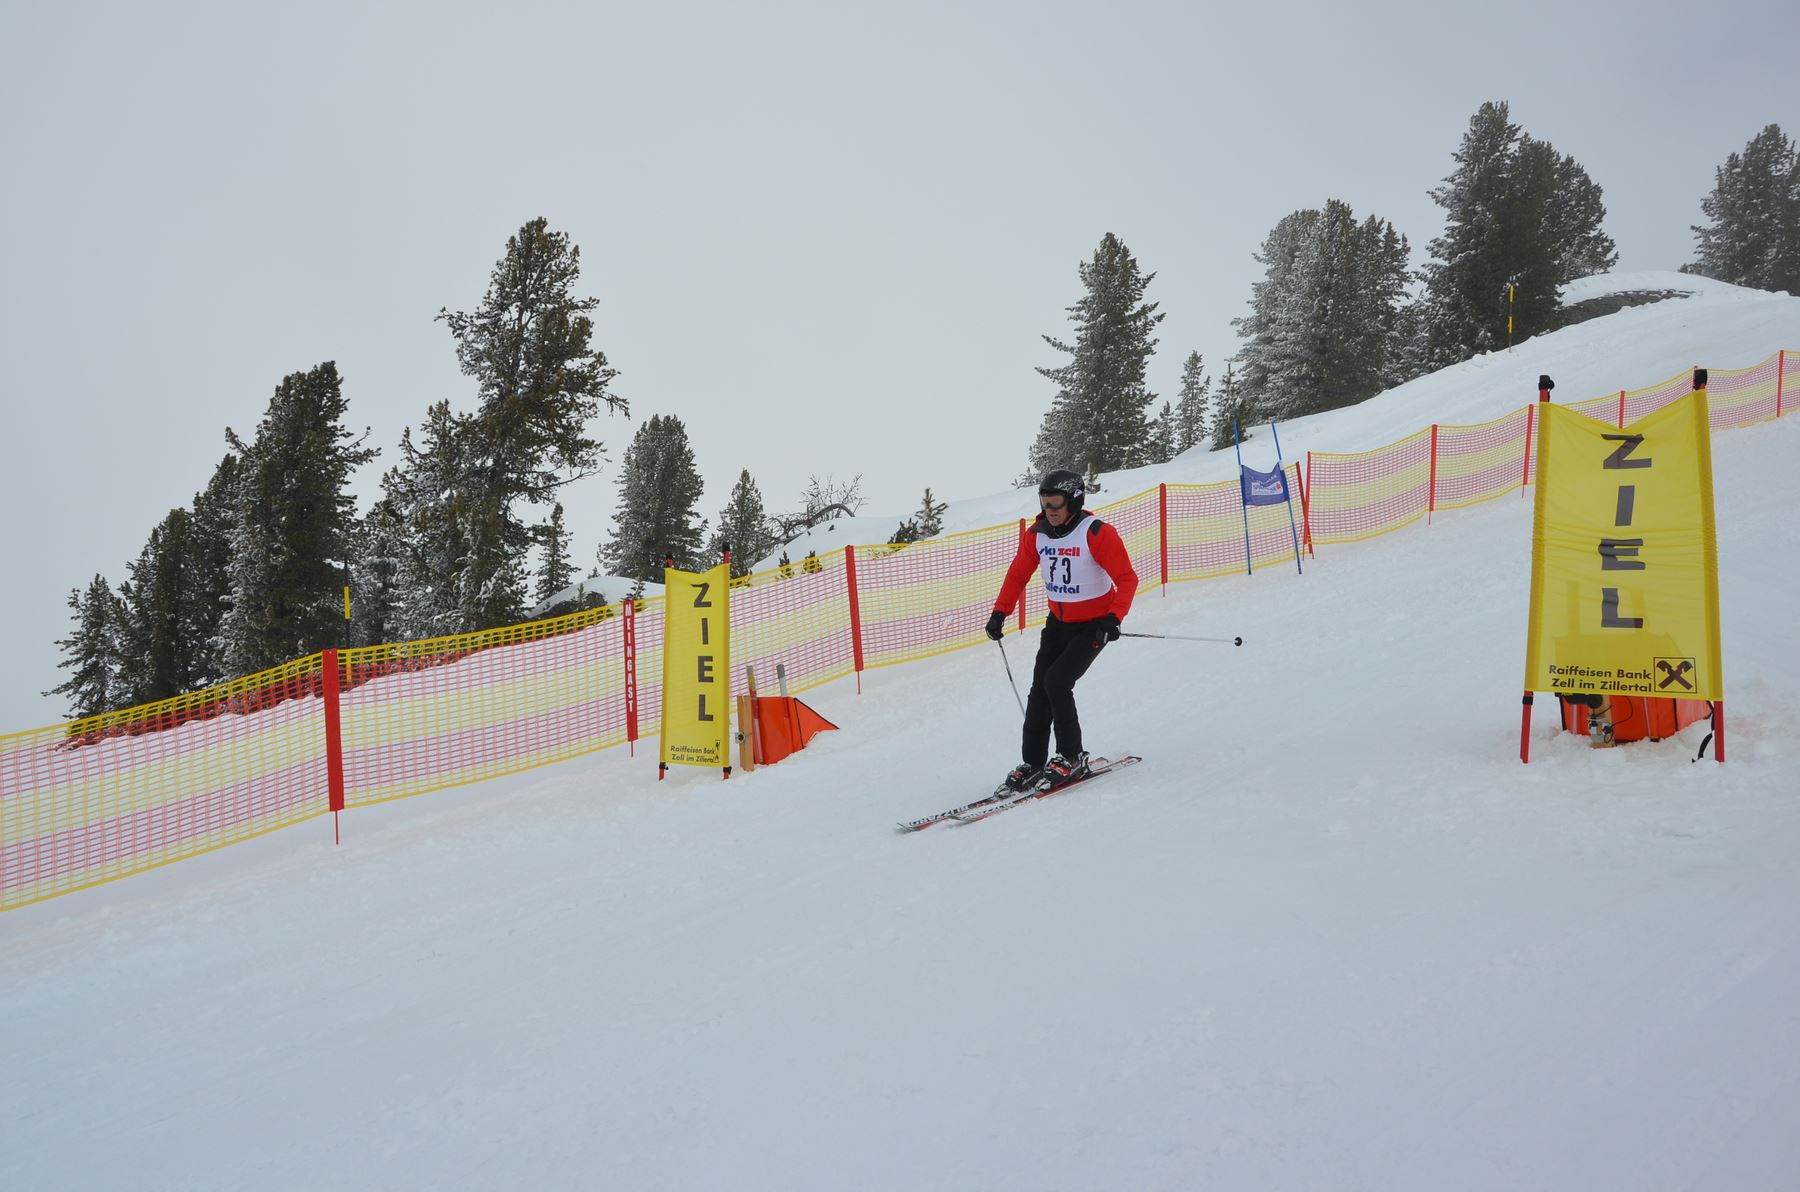 2015-03-22 BV Zillertal Skirennen 187.JPG